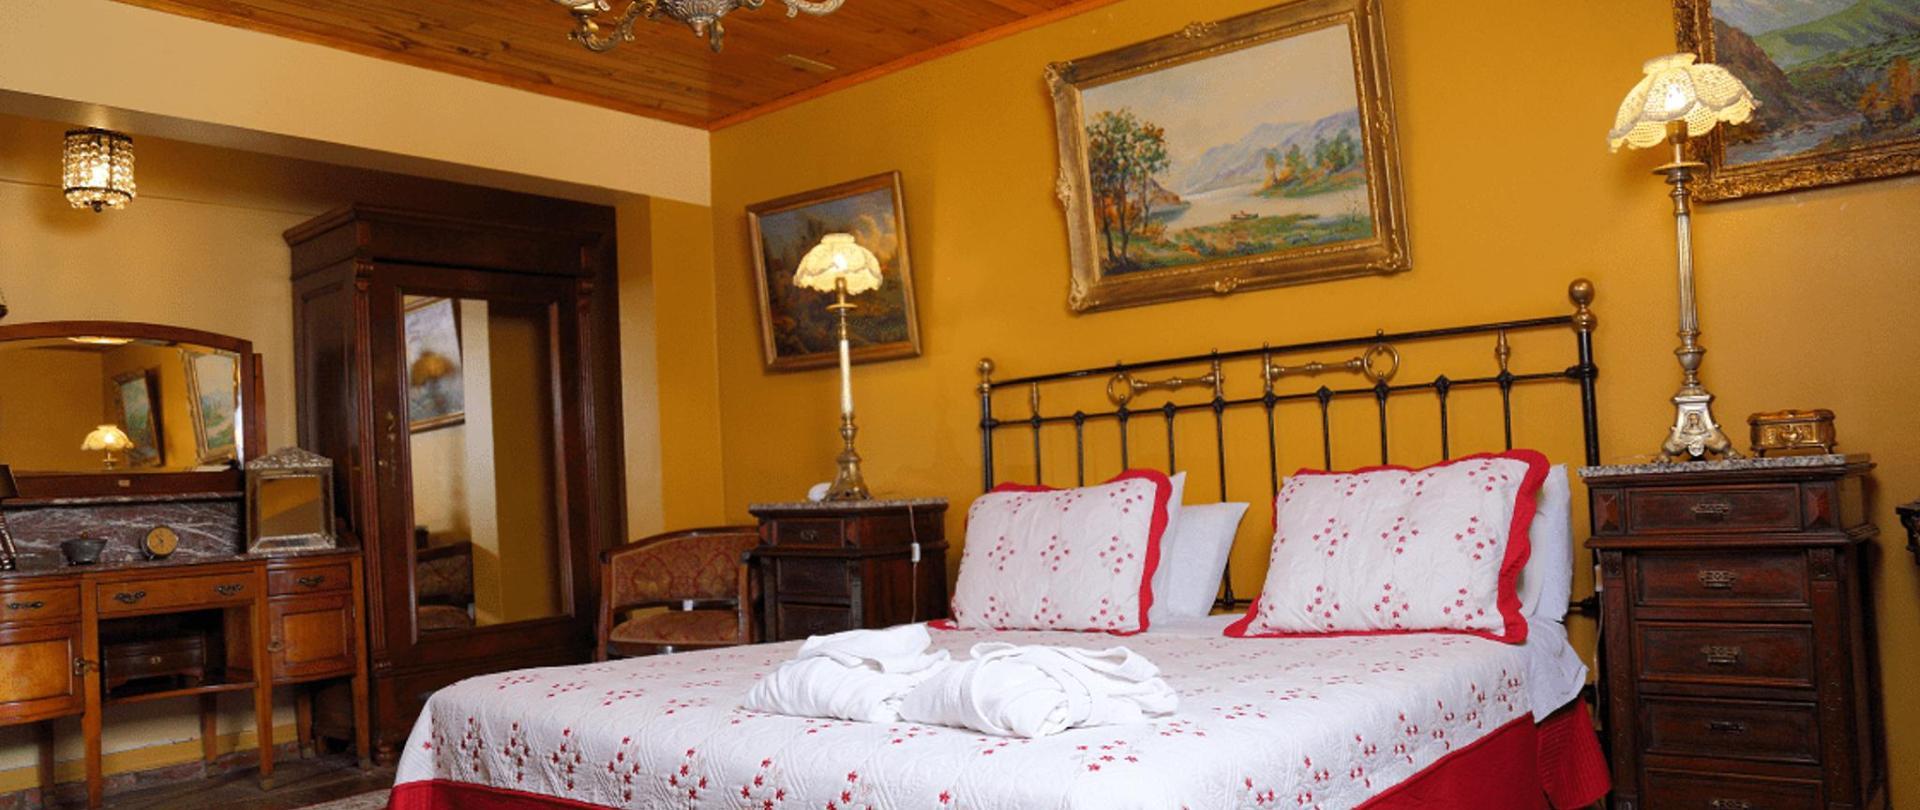 HOTEL BOUTIQUE VINTAGE SANTA CRUZ 02-min.png